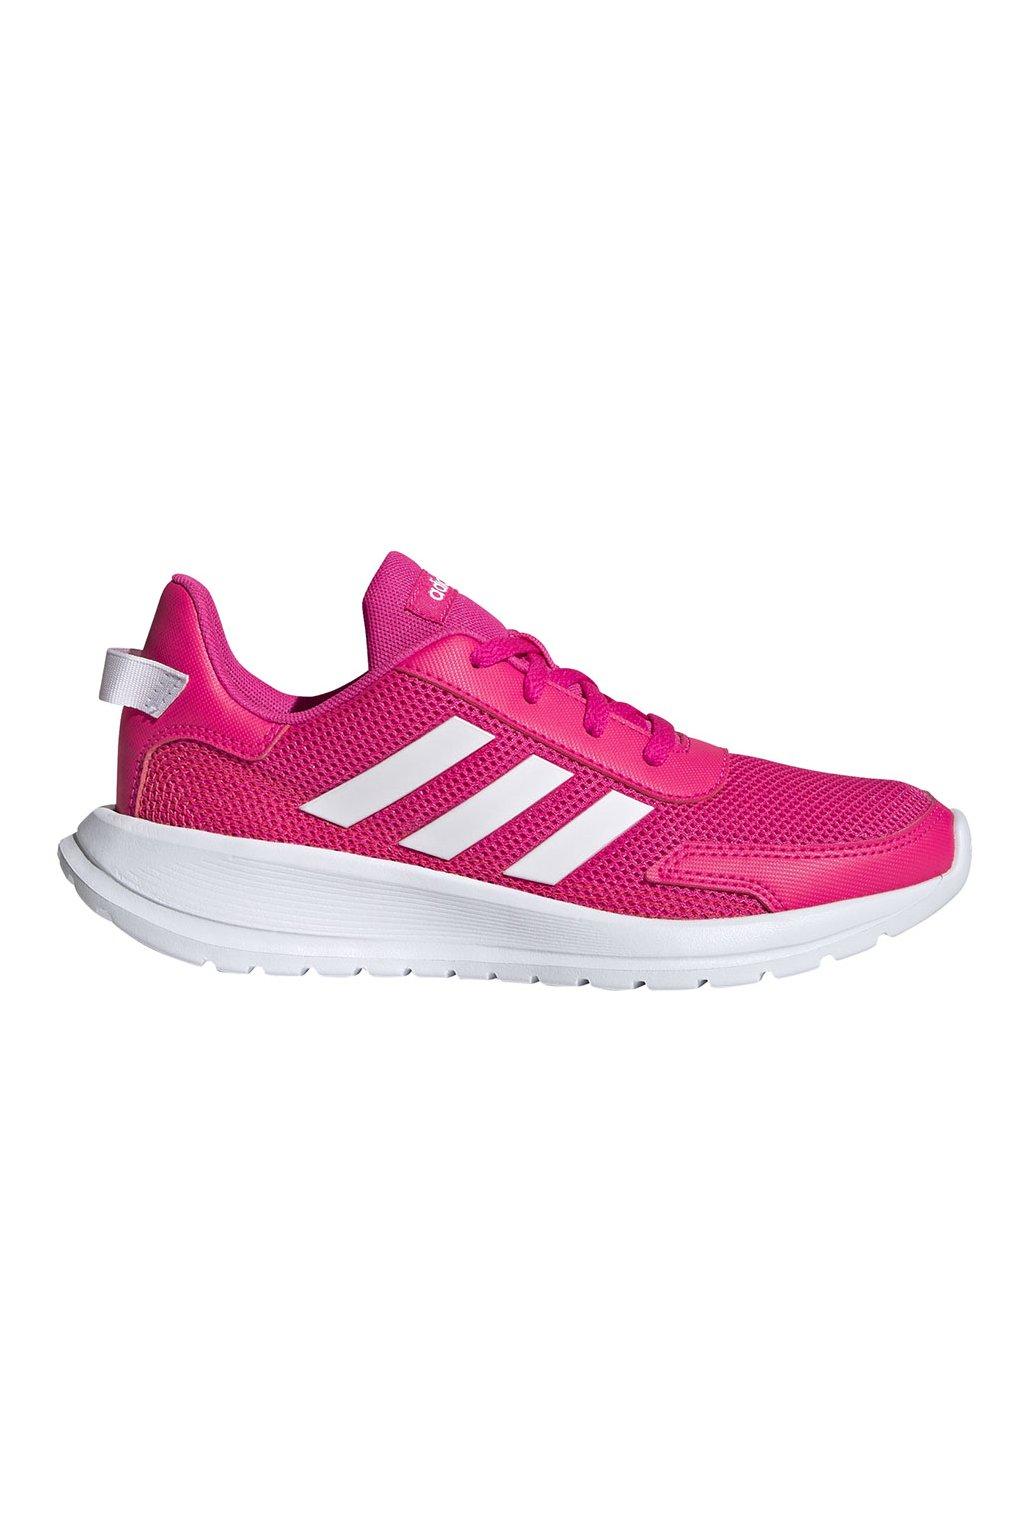 Detská obuv Adidas Tensaur Run K ružovo-biela EG4126